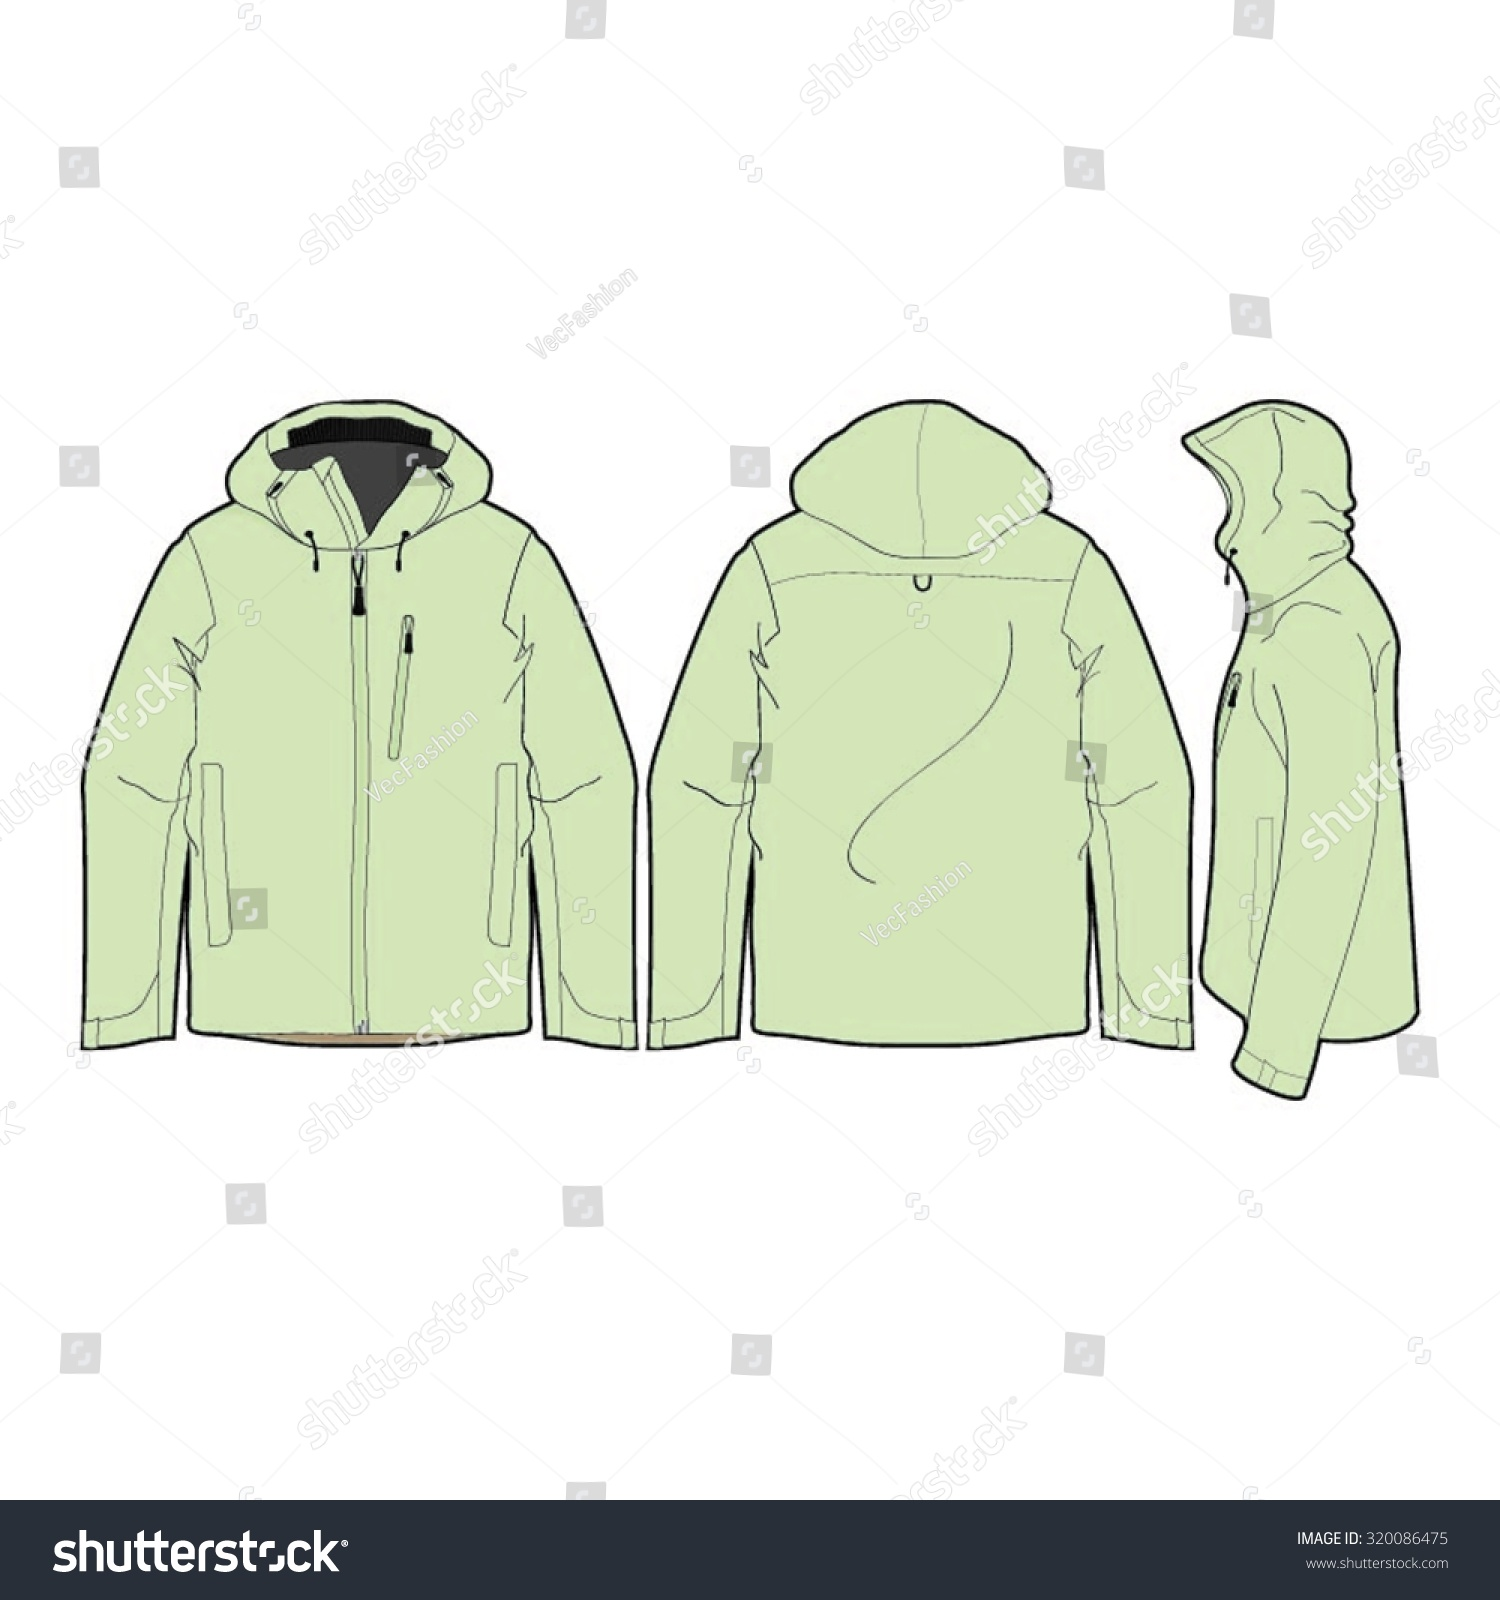 b369d55712 Outdoor Climbing Jacket Template Stock Vector (Royalty Free) 320086475